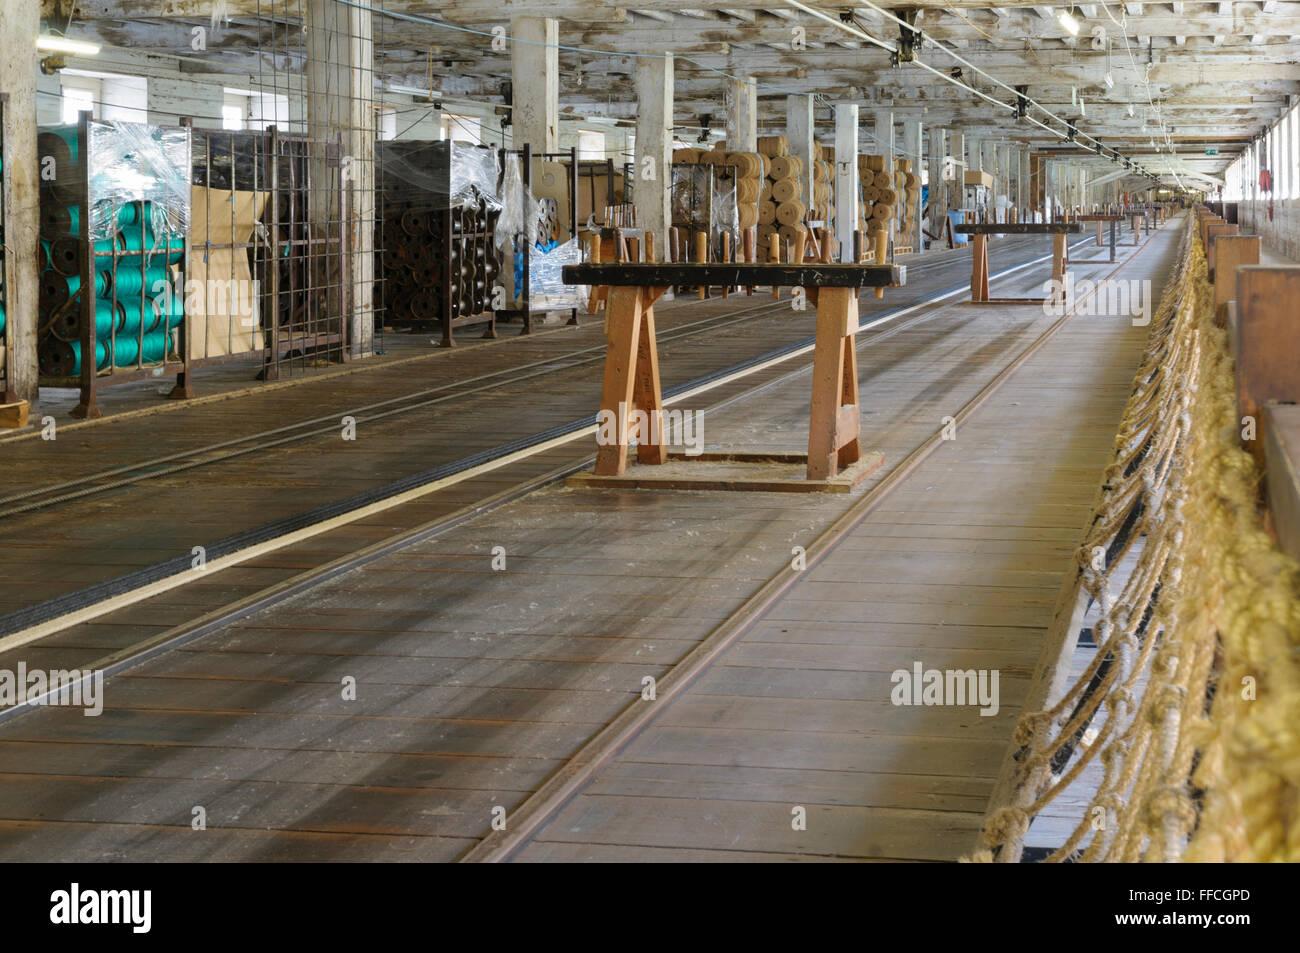 The rope walk, Chatham historic dockyard, Kent, England, UK - Stock Image